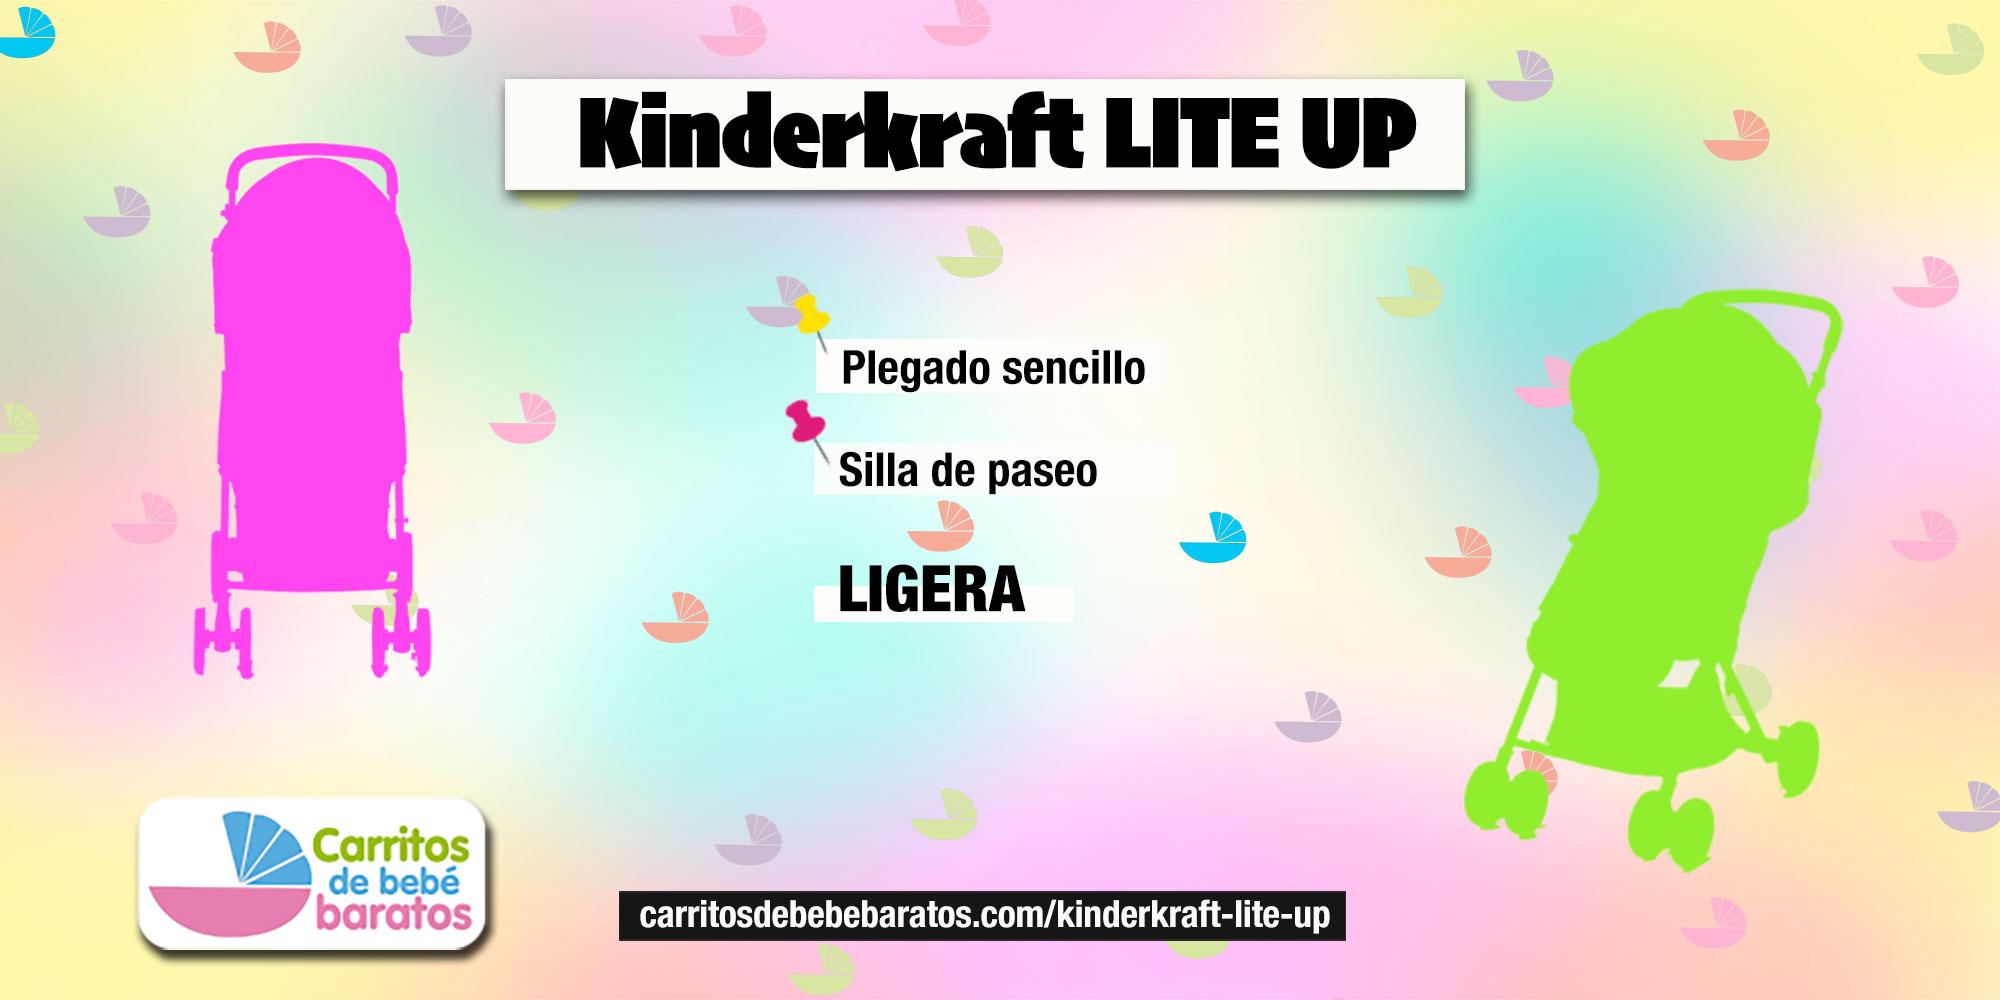 Kinderkraft Lite Up